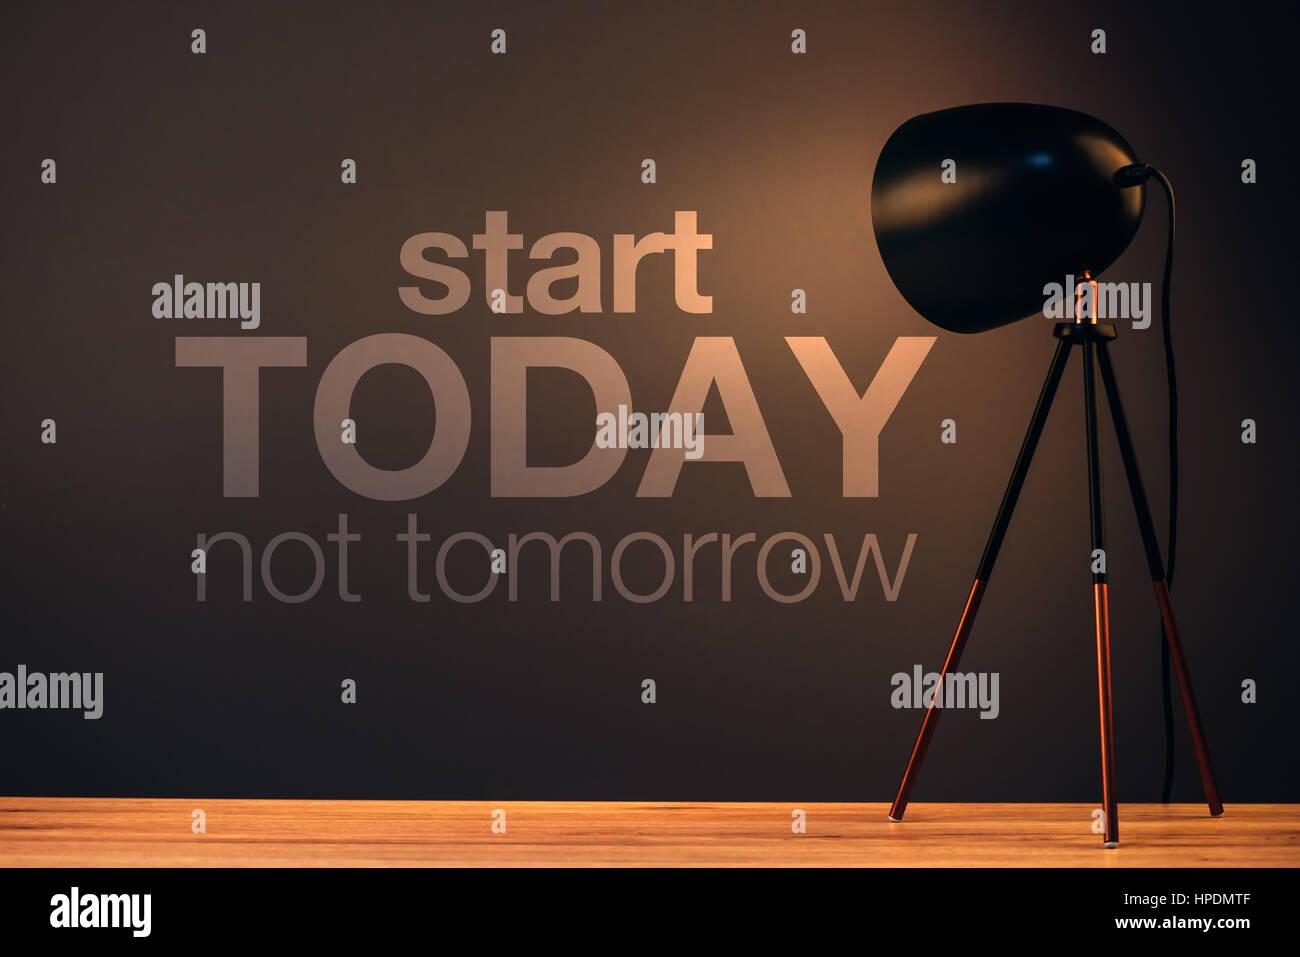 Empiece hoy, no mañana cita motivacionales en Office wall Imagen De Stock